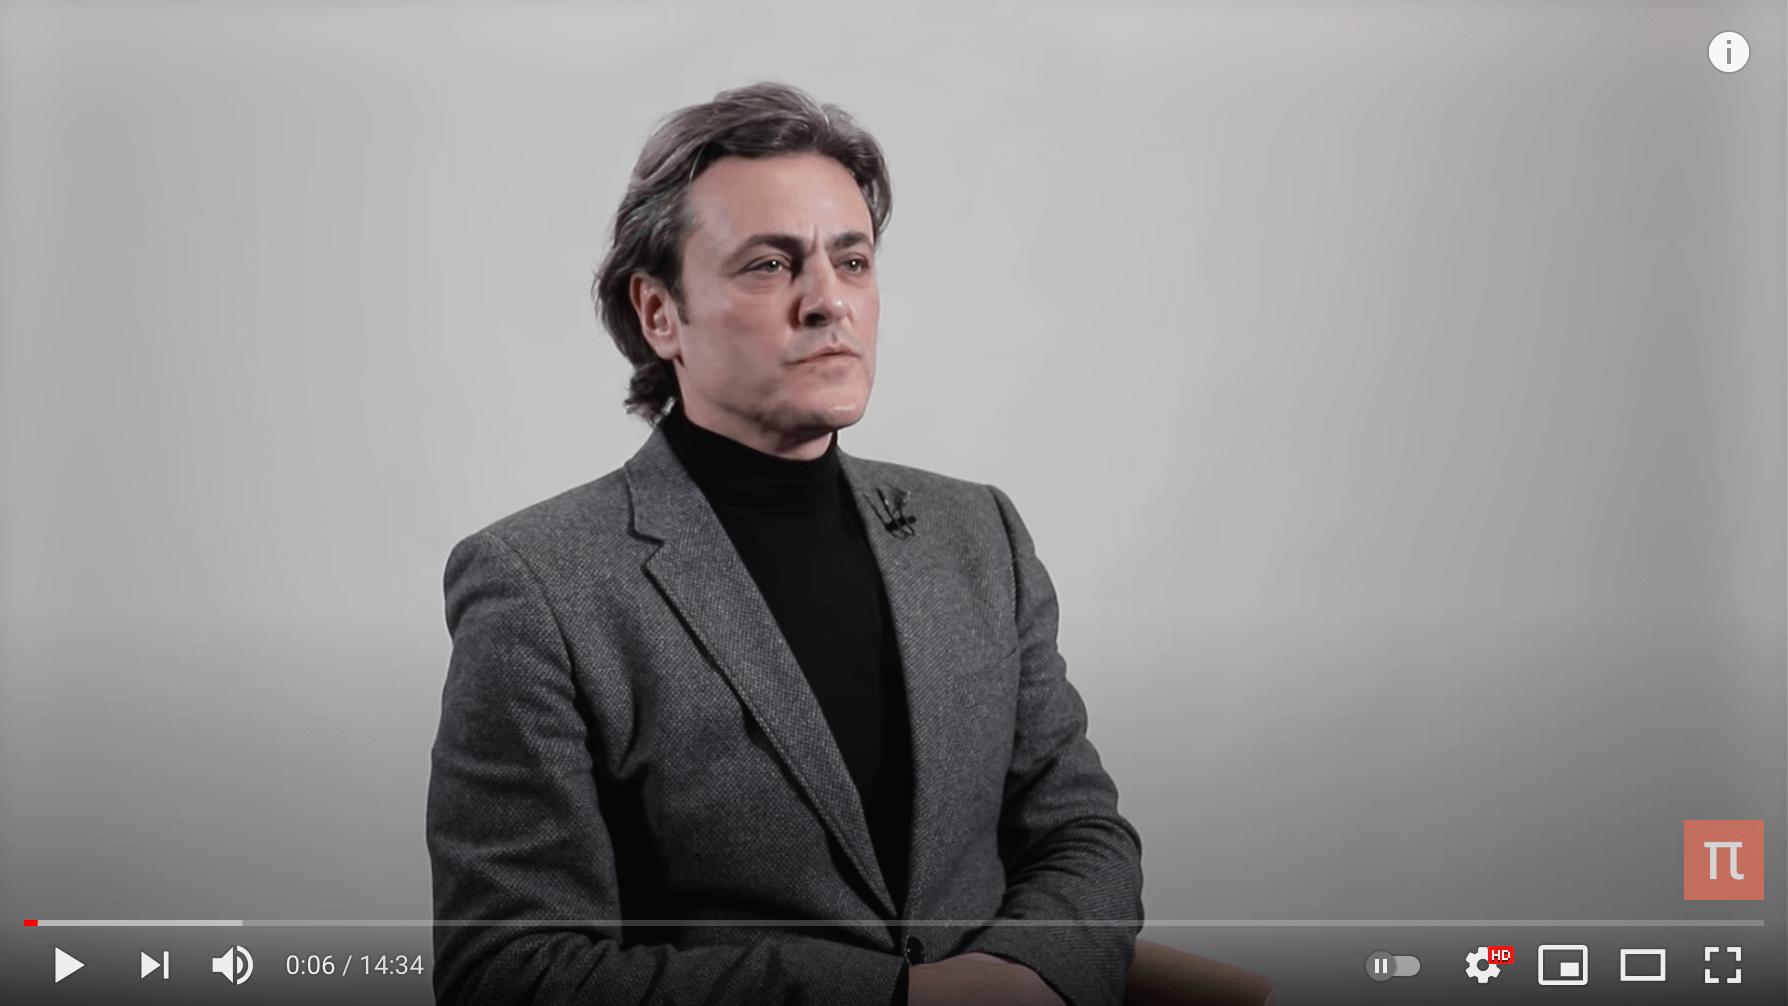 Анатолий Хархурин омоделях креативности